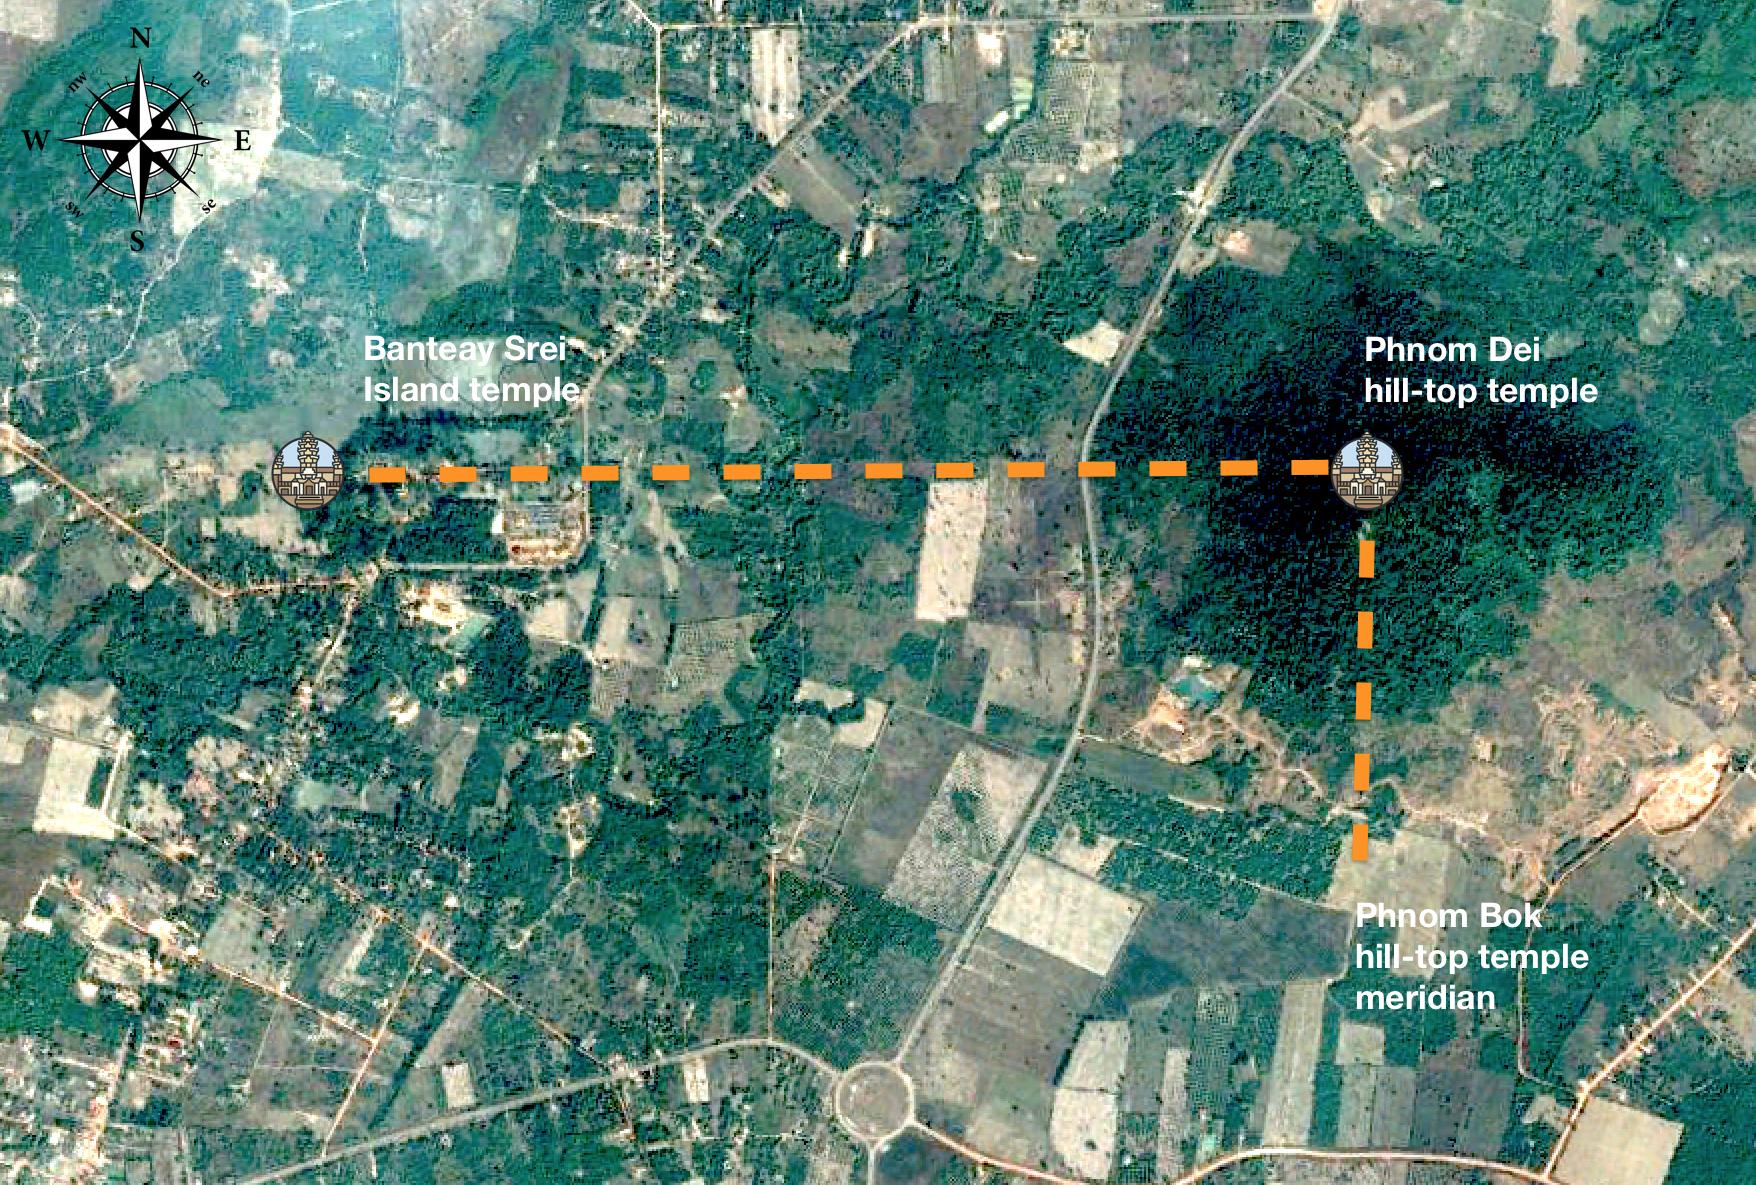 Figure 13: Banteay Srei Temple alignment with Phnom Dei hill-top temple.